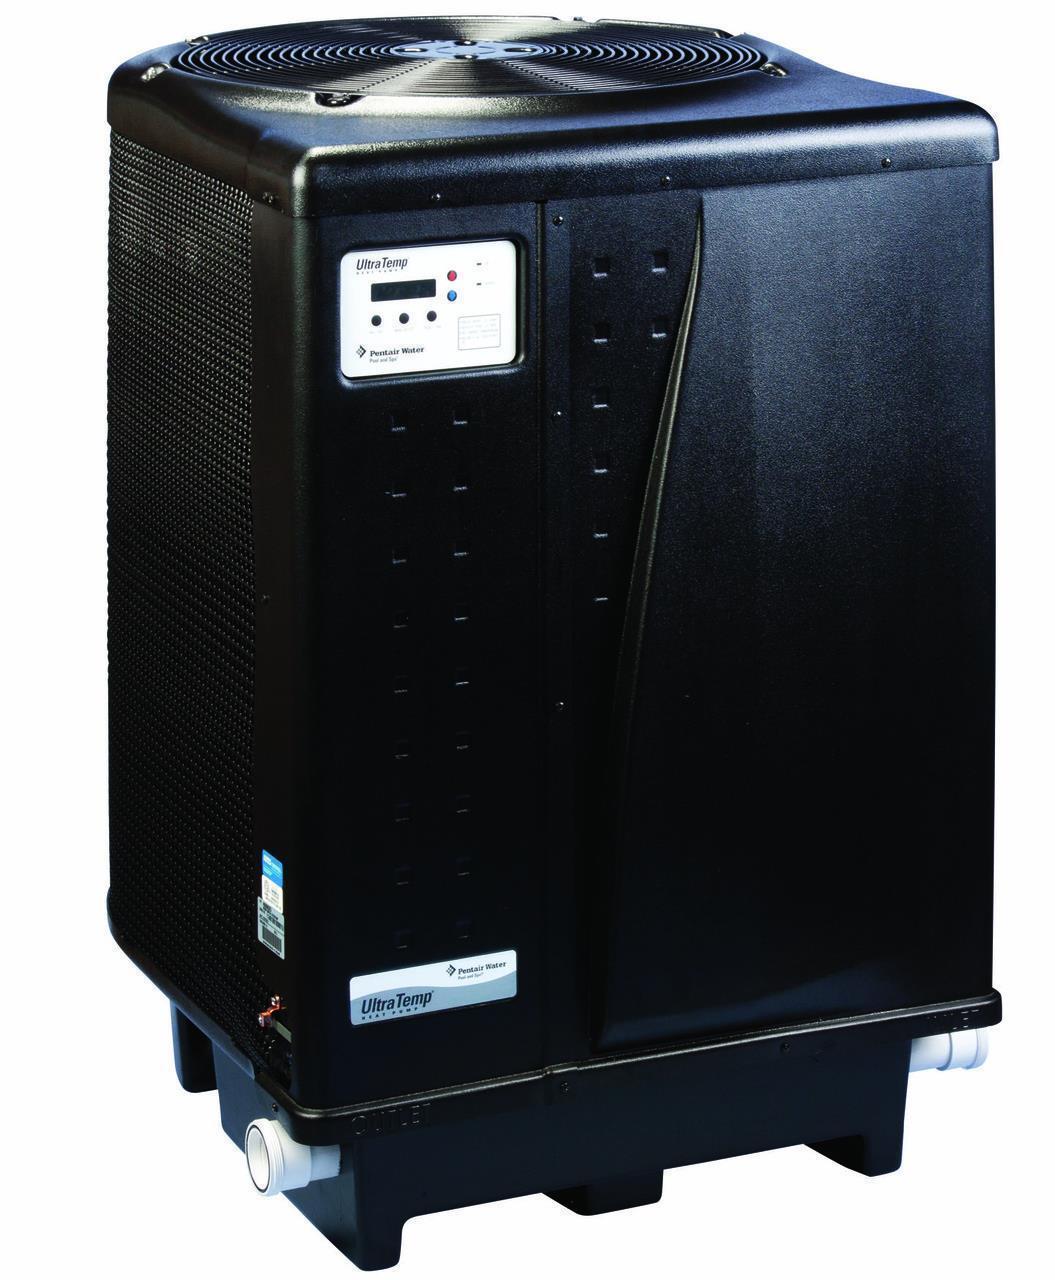 Pentair ultratemp 120 high performance heat pump 125k btu for Pool heater